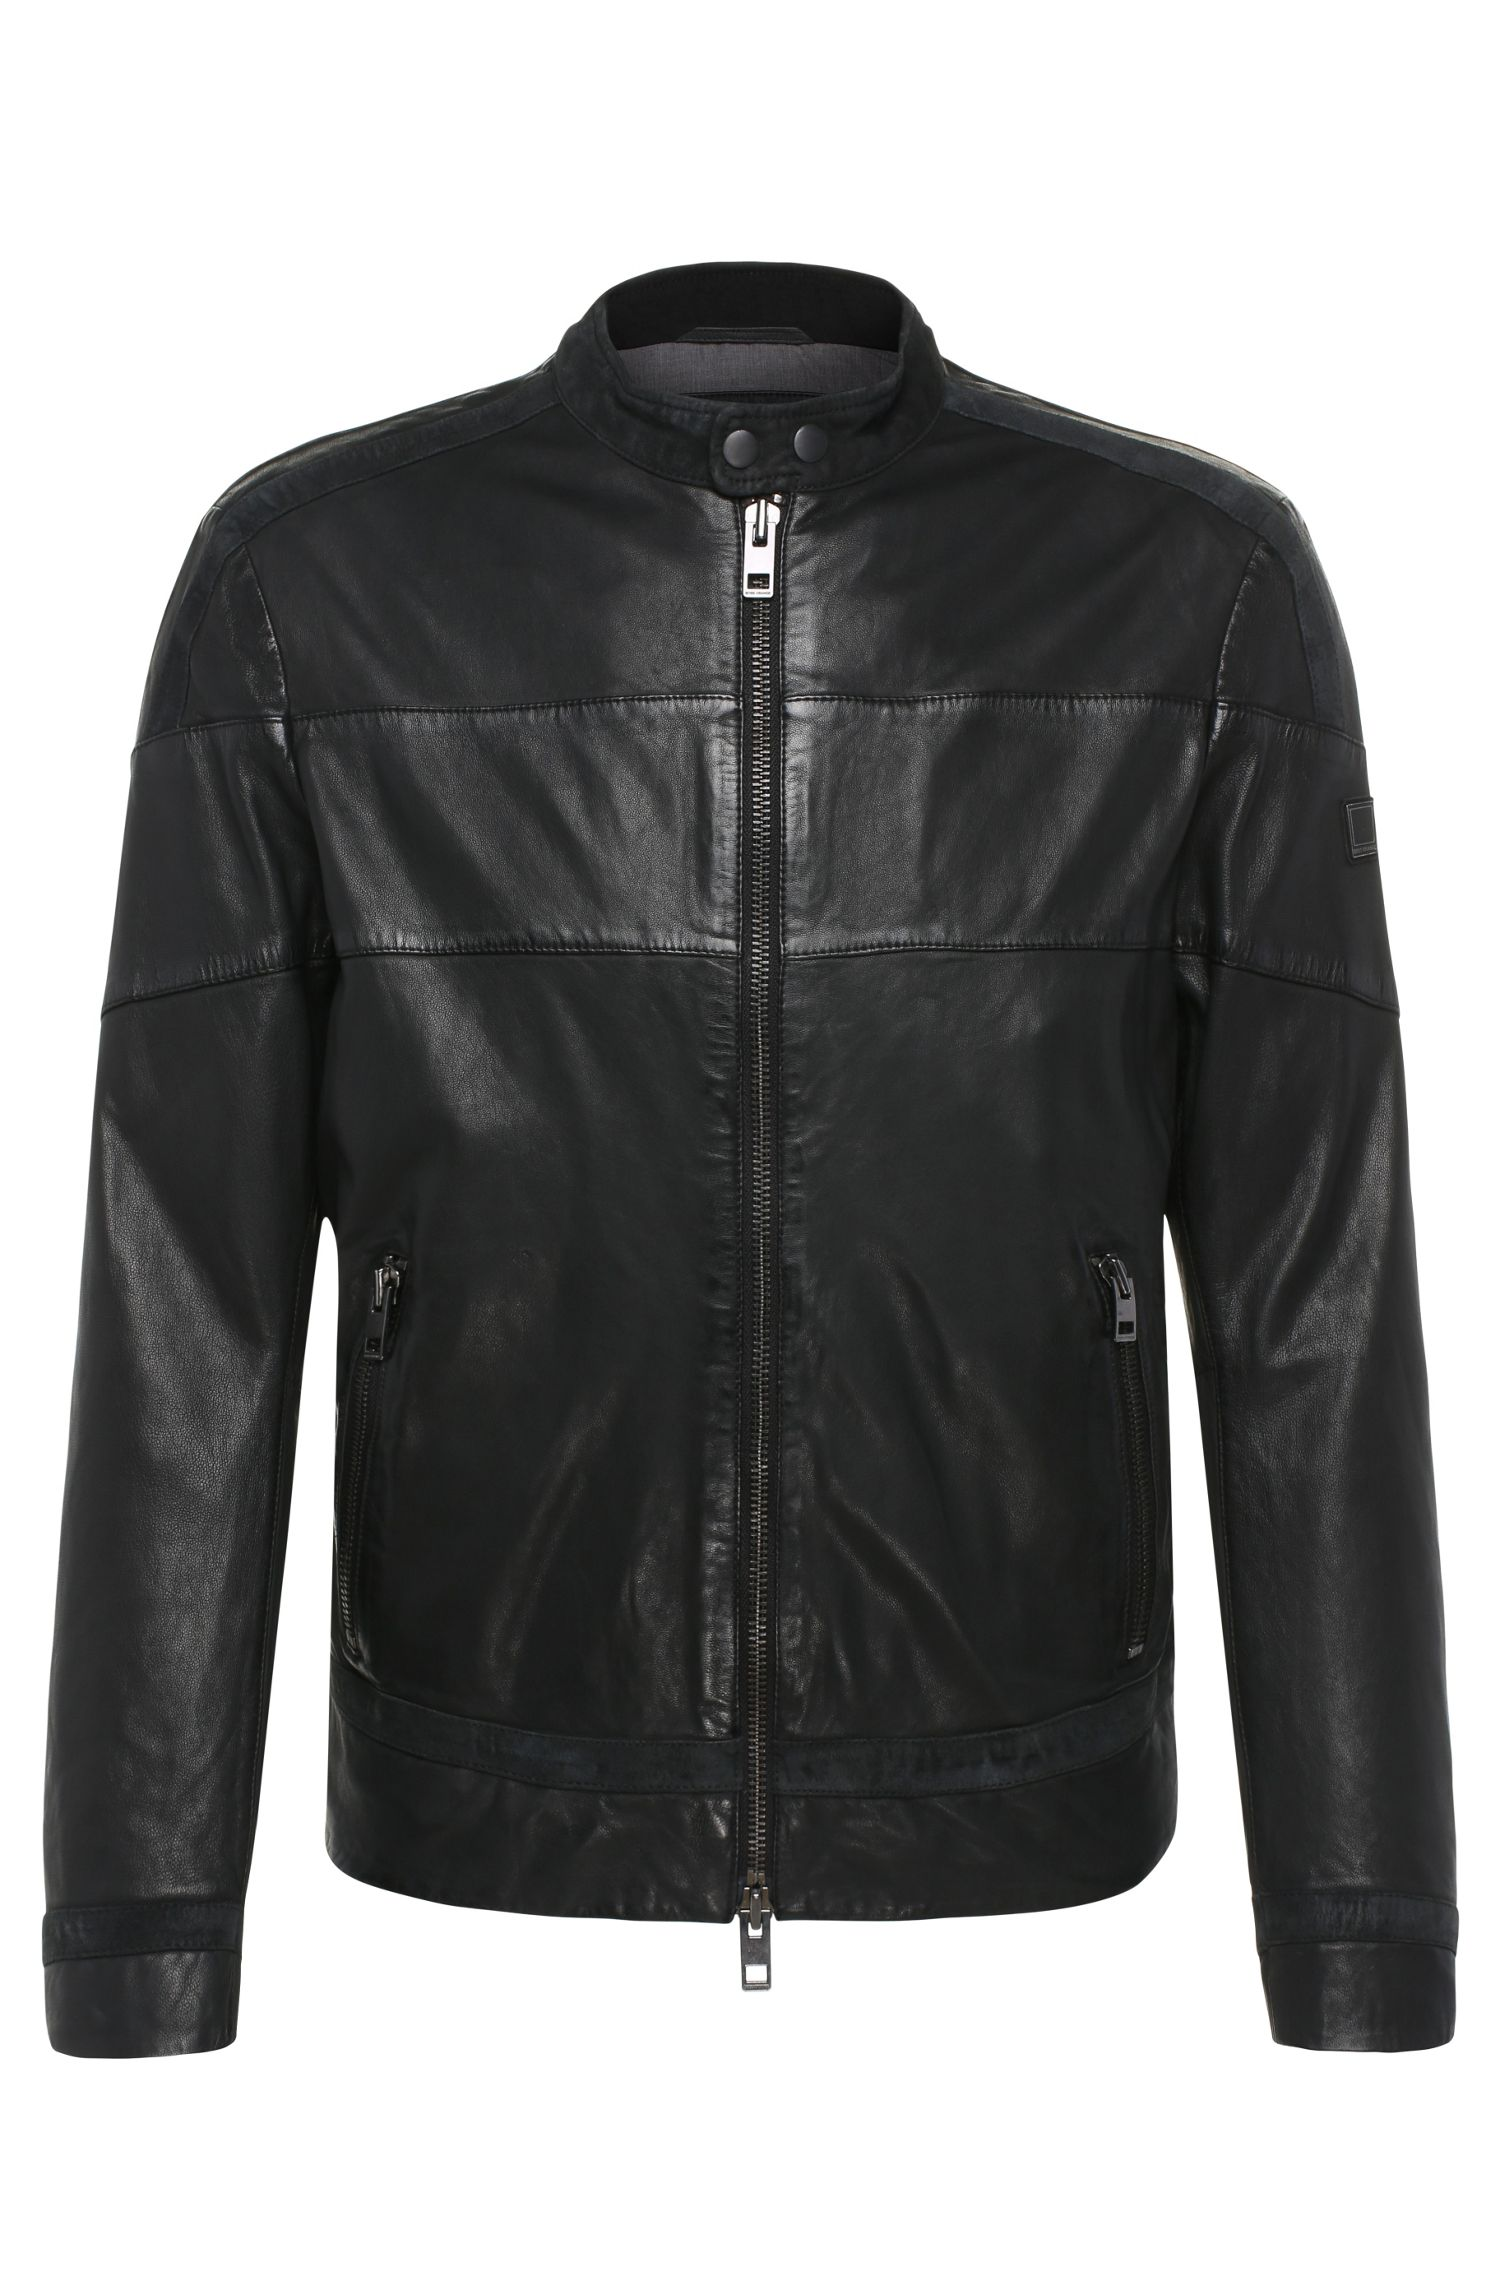 Sheepskin Paneled Biker Jacket | Jondro